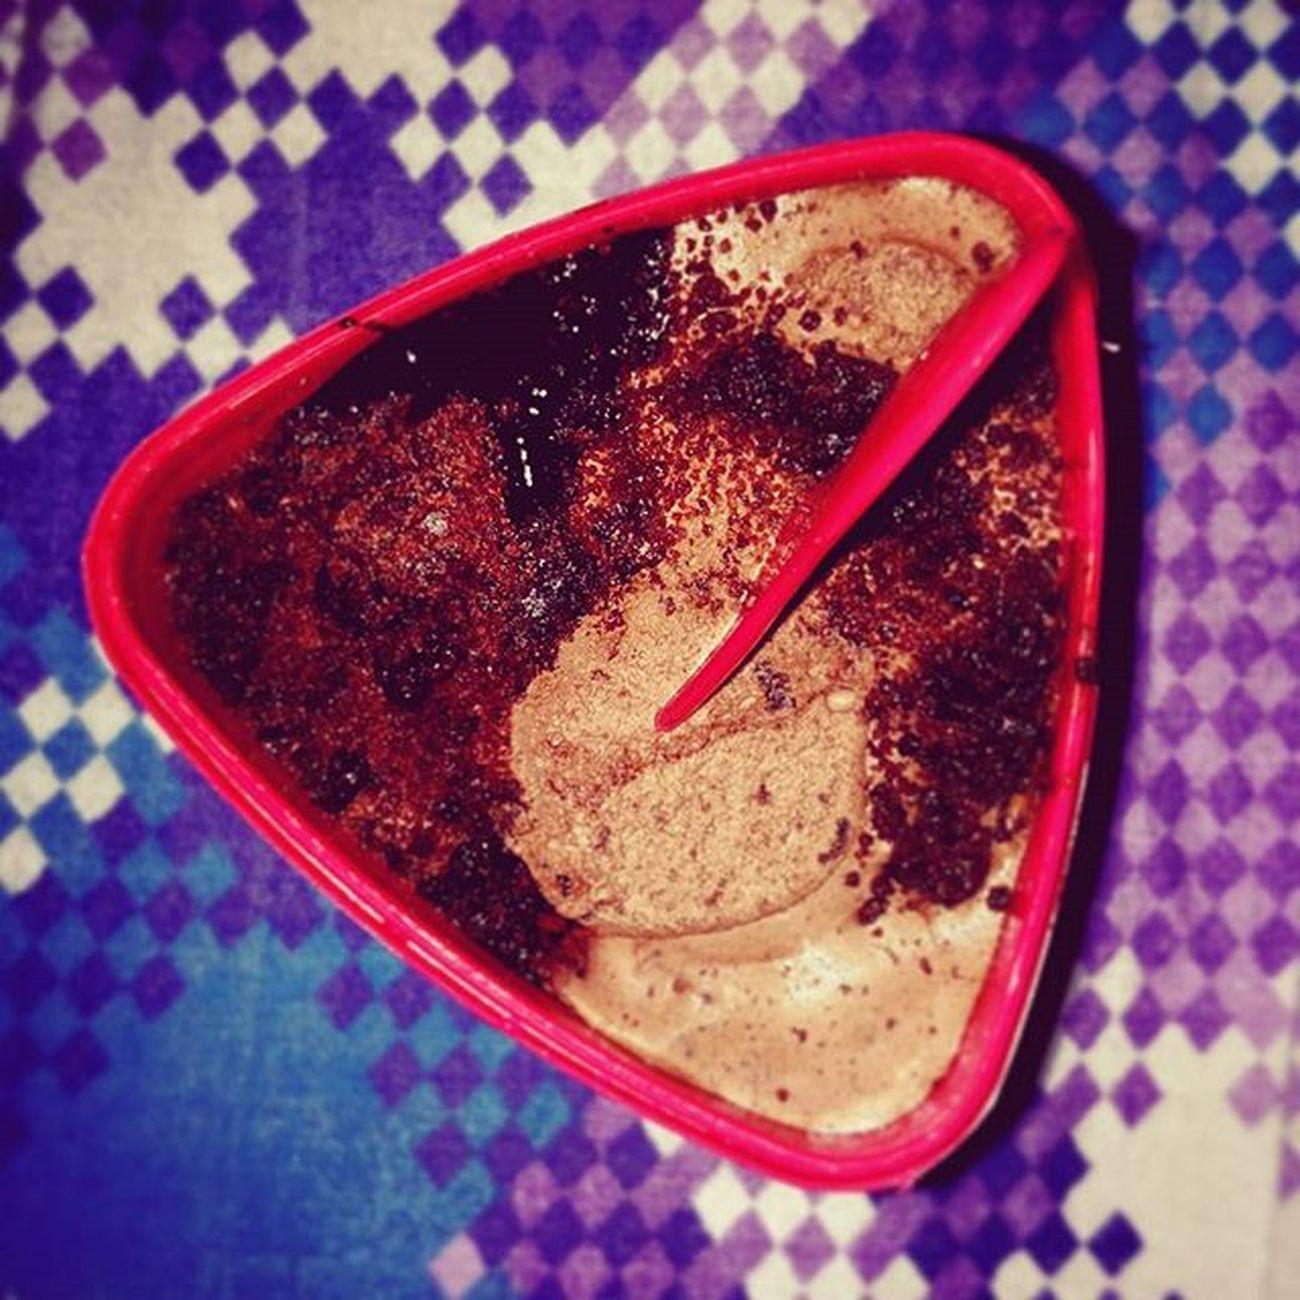 HokeyPokey Doublechocolatetherapy Creamy Sweet Superb Icecream Yummy Peace Soft Lovely Satisfied